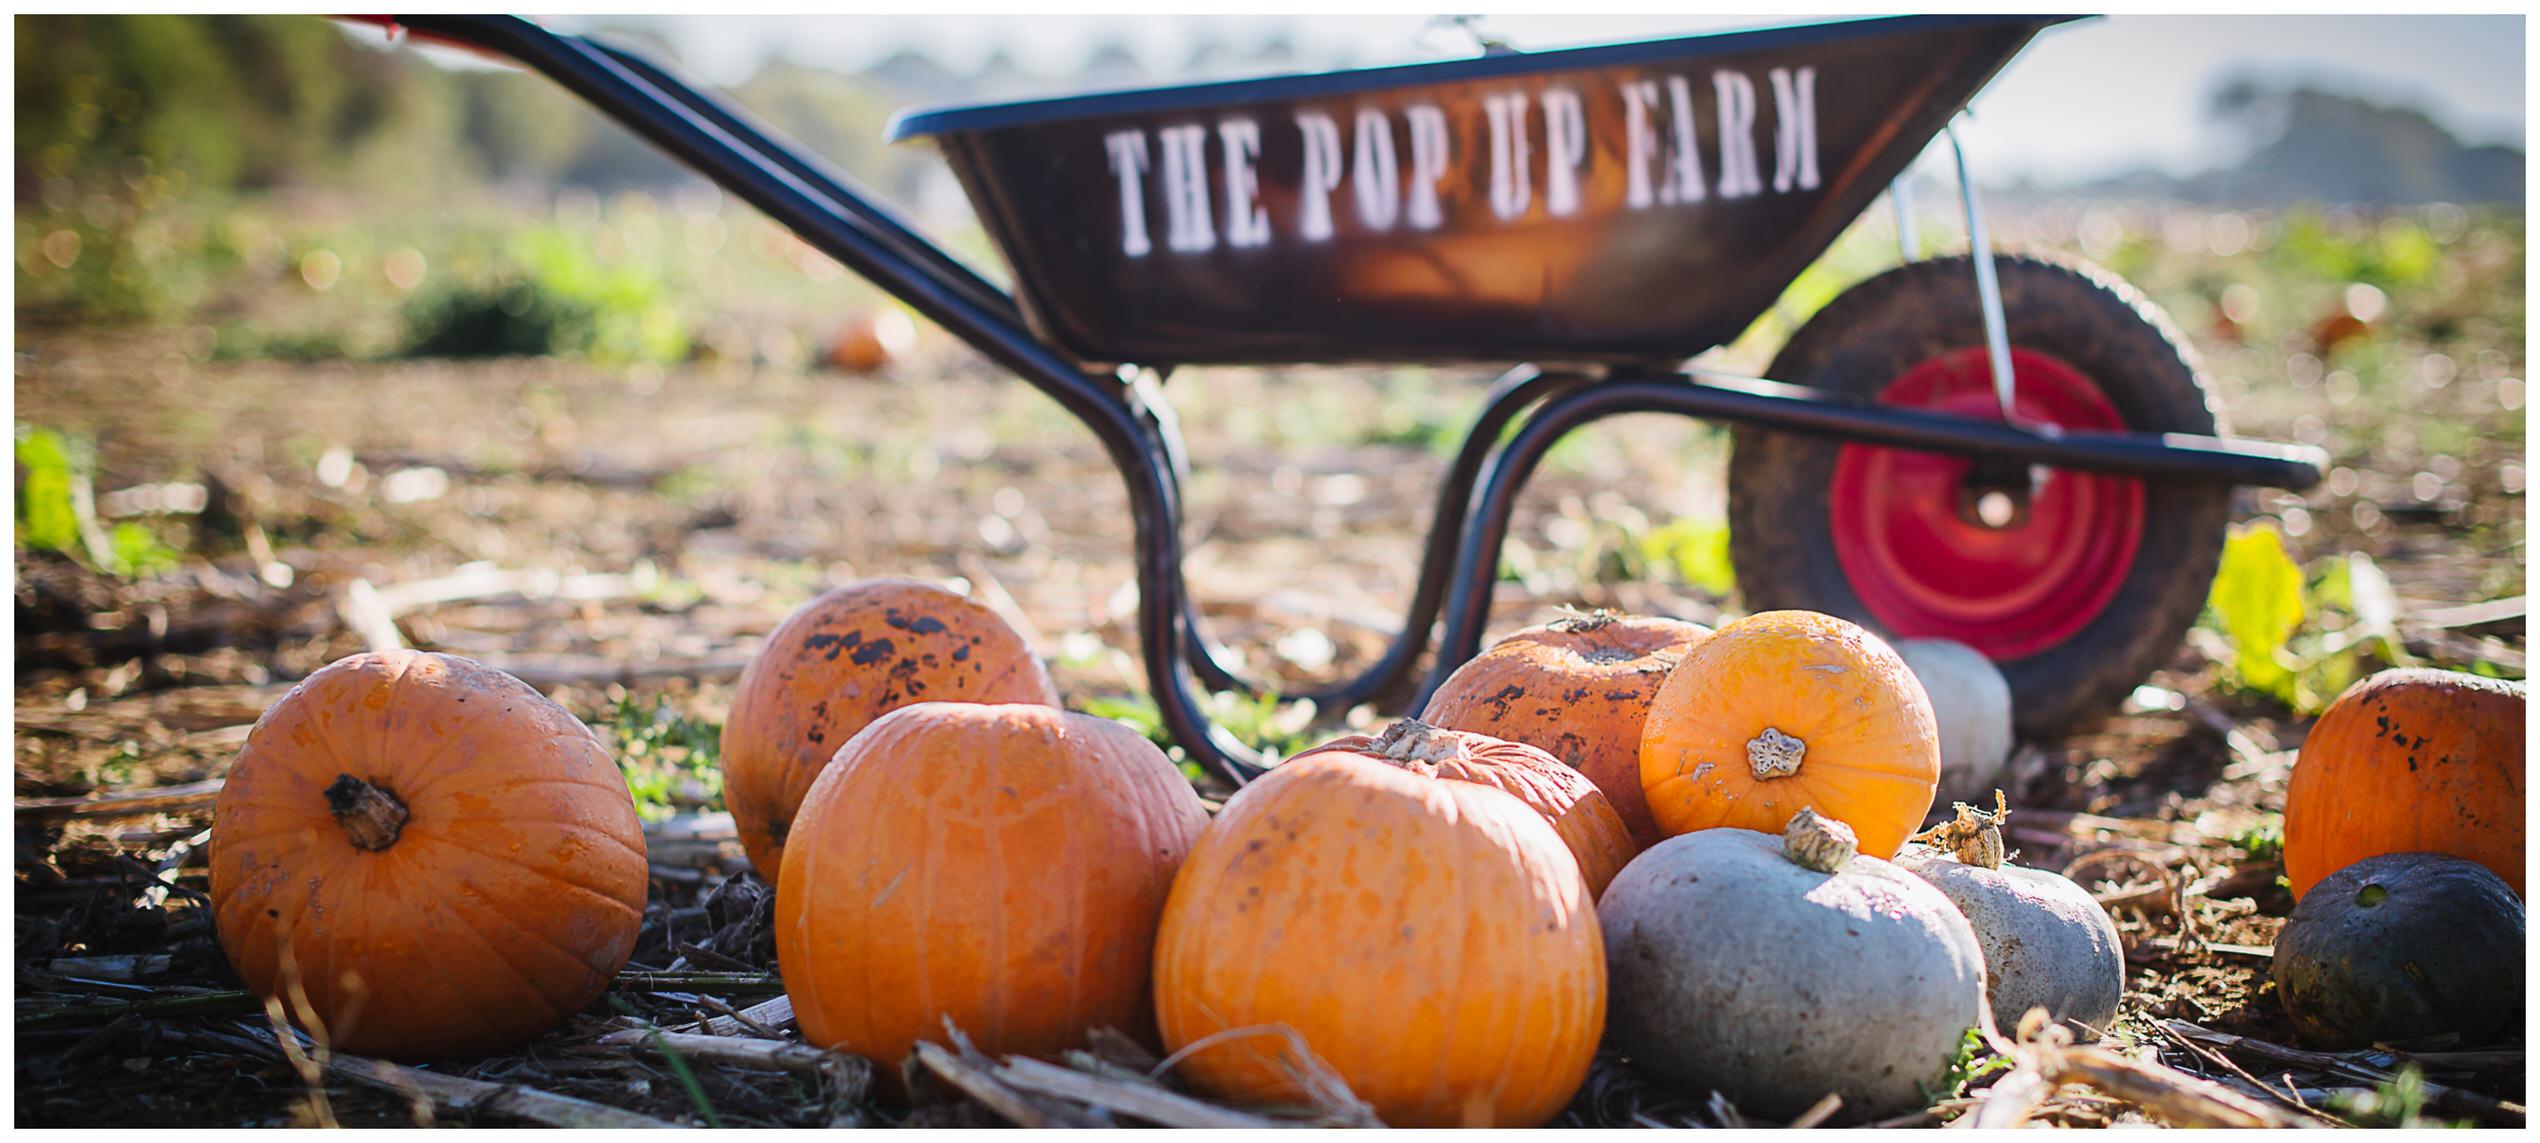 a selection of pumpkin varieties at the pop up pumpkin farm